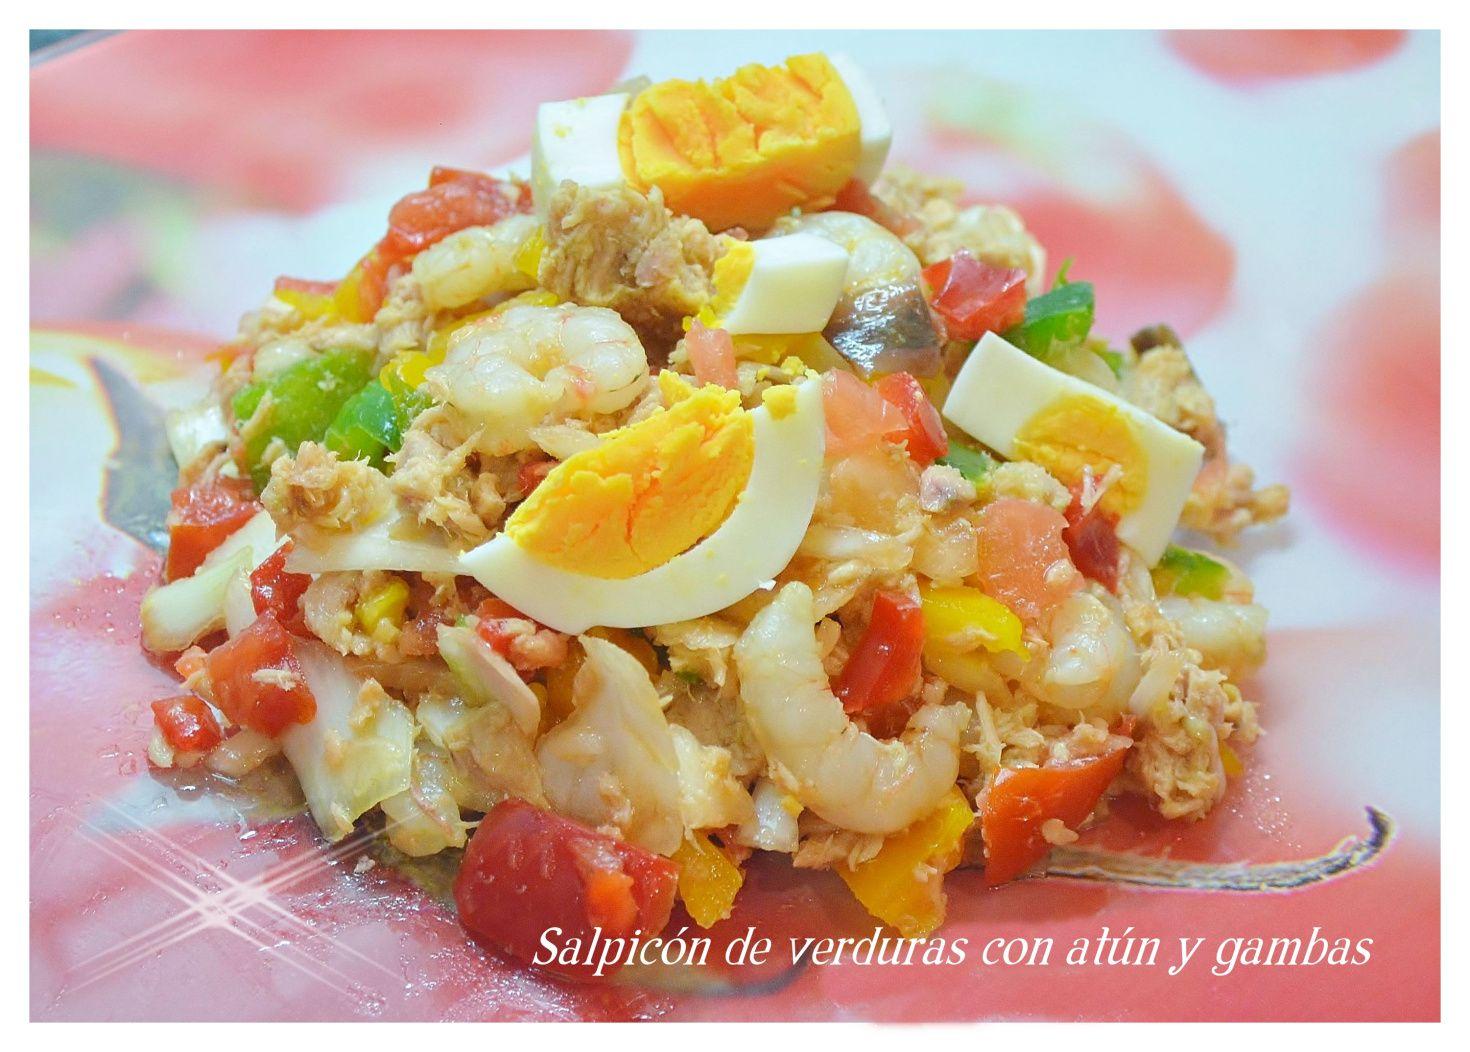 Salpicón de verduras con atún y gambas.